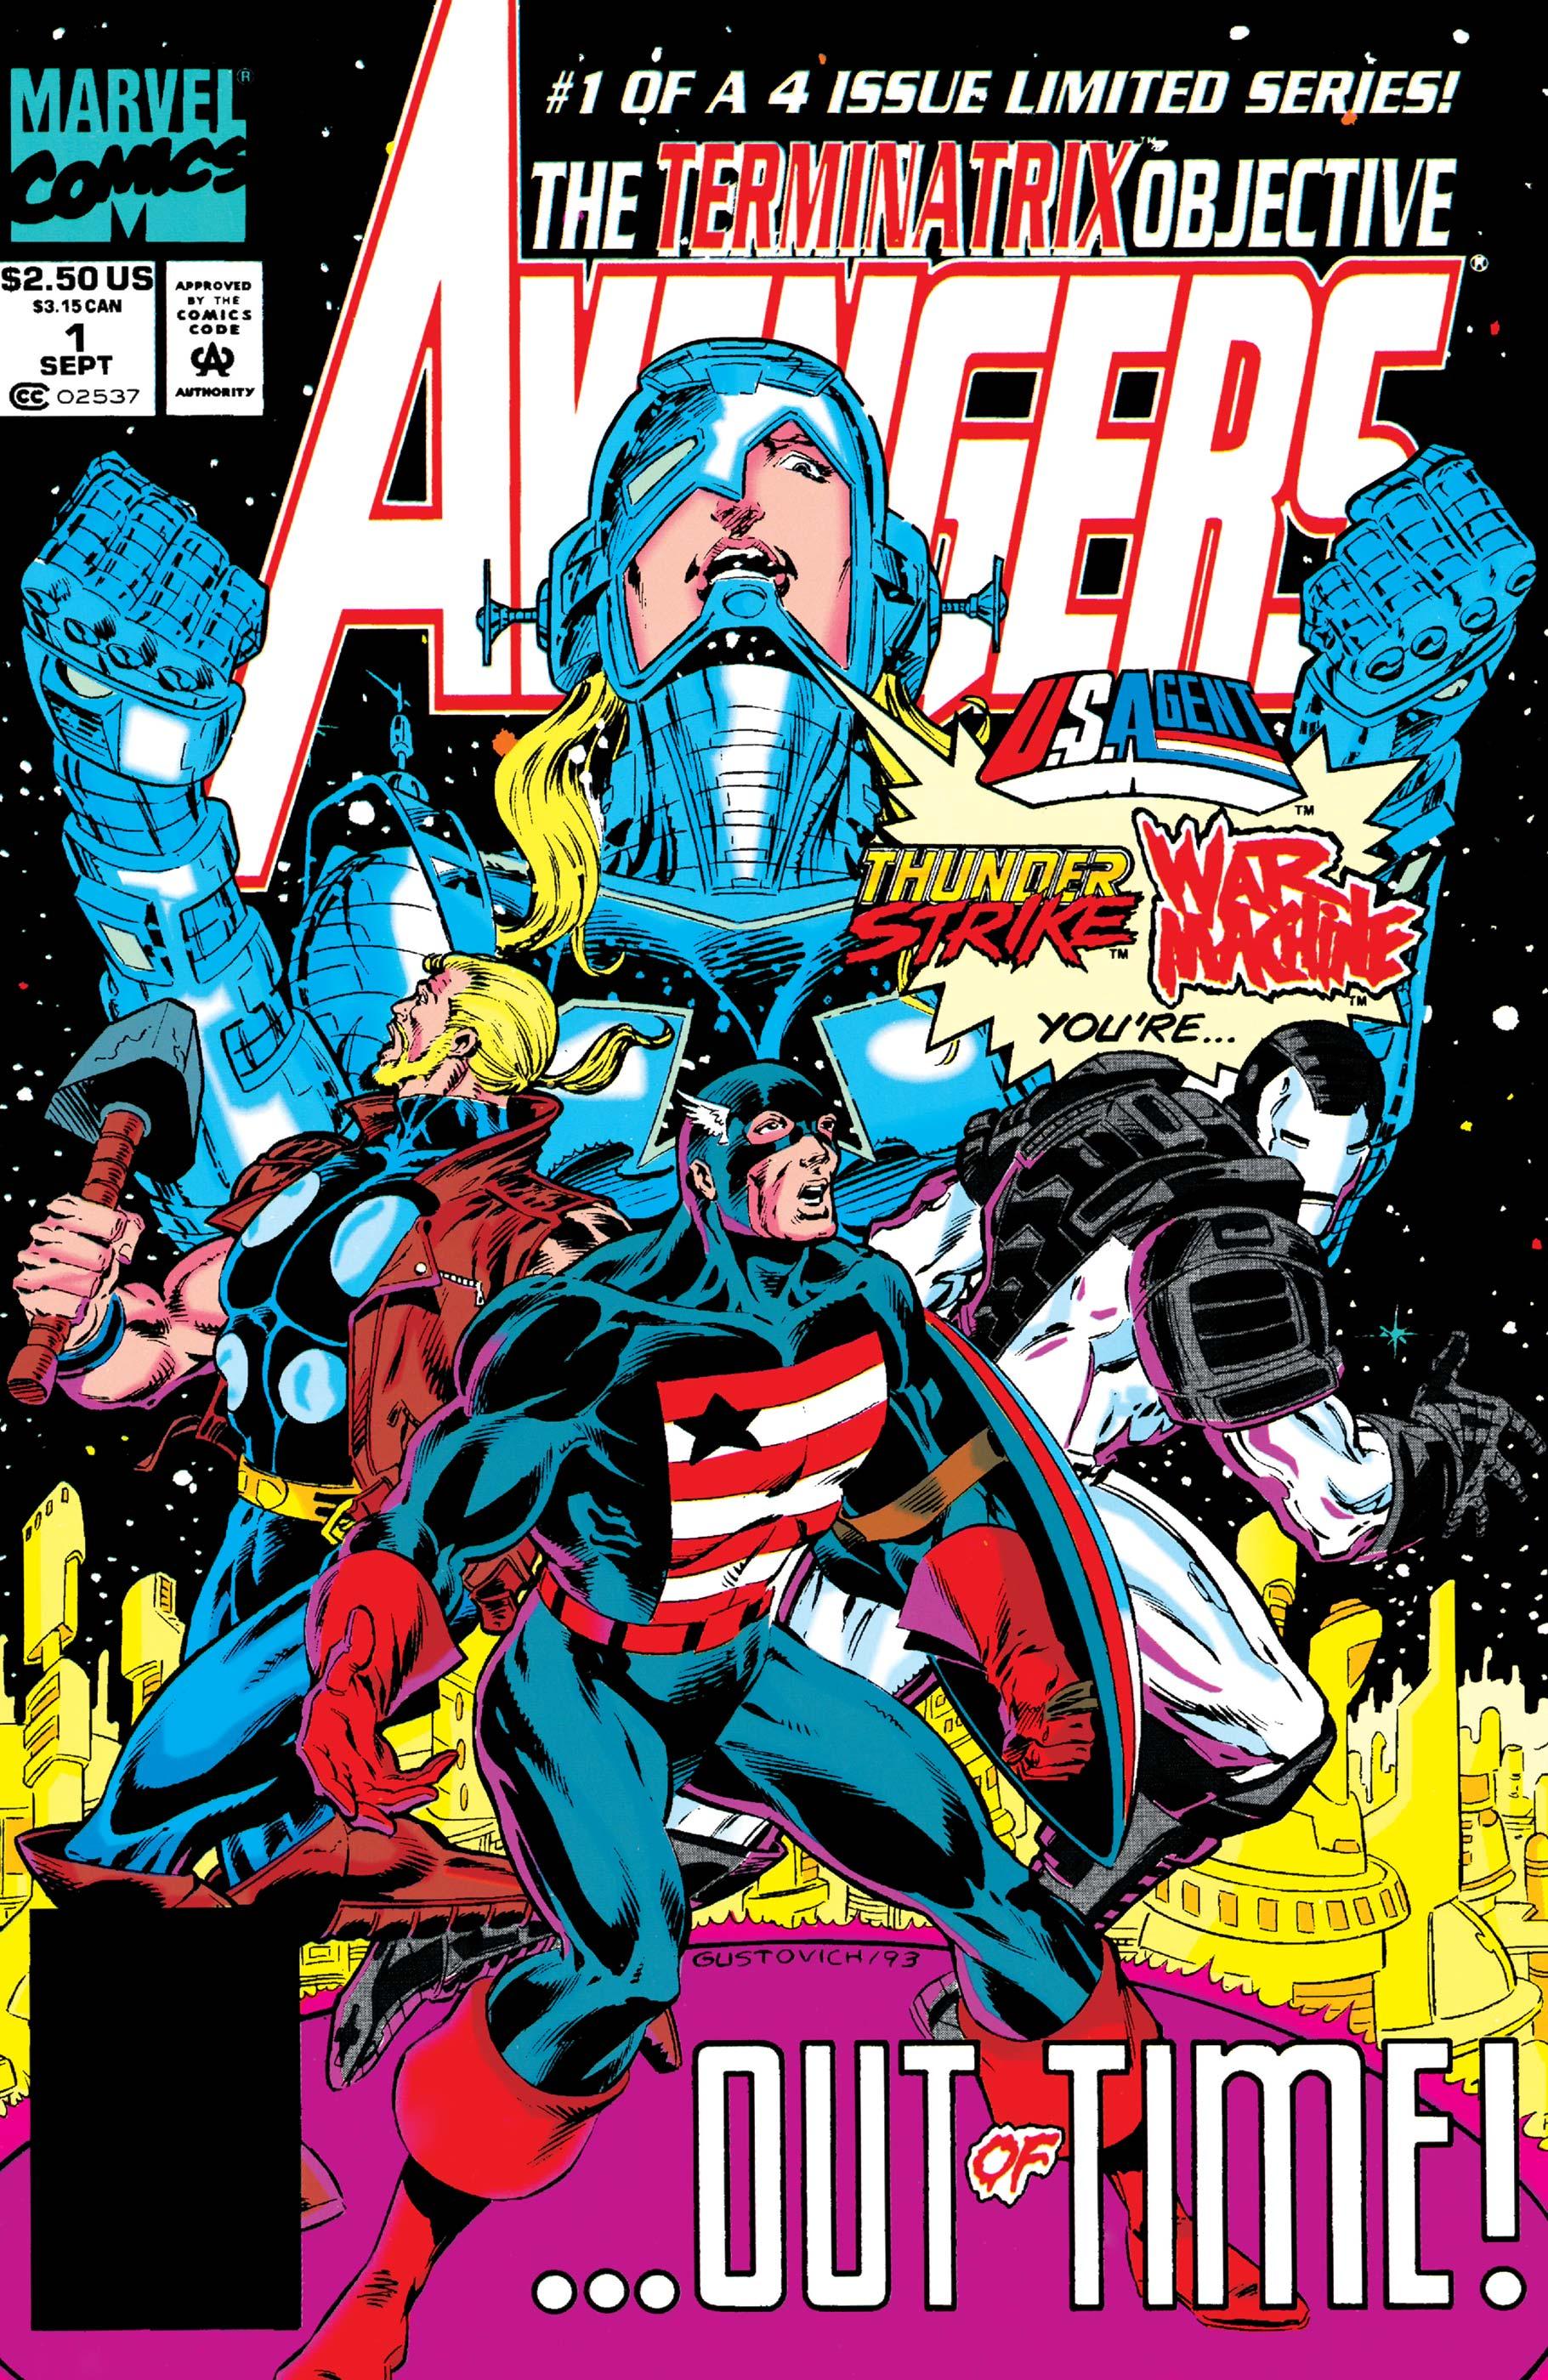 Avengers: The Terminatrix Objective (1993) #1